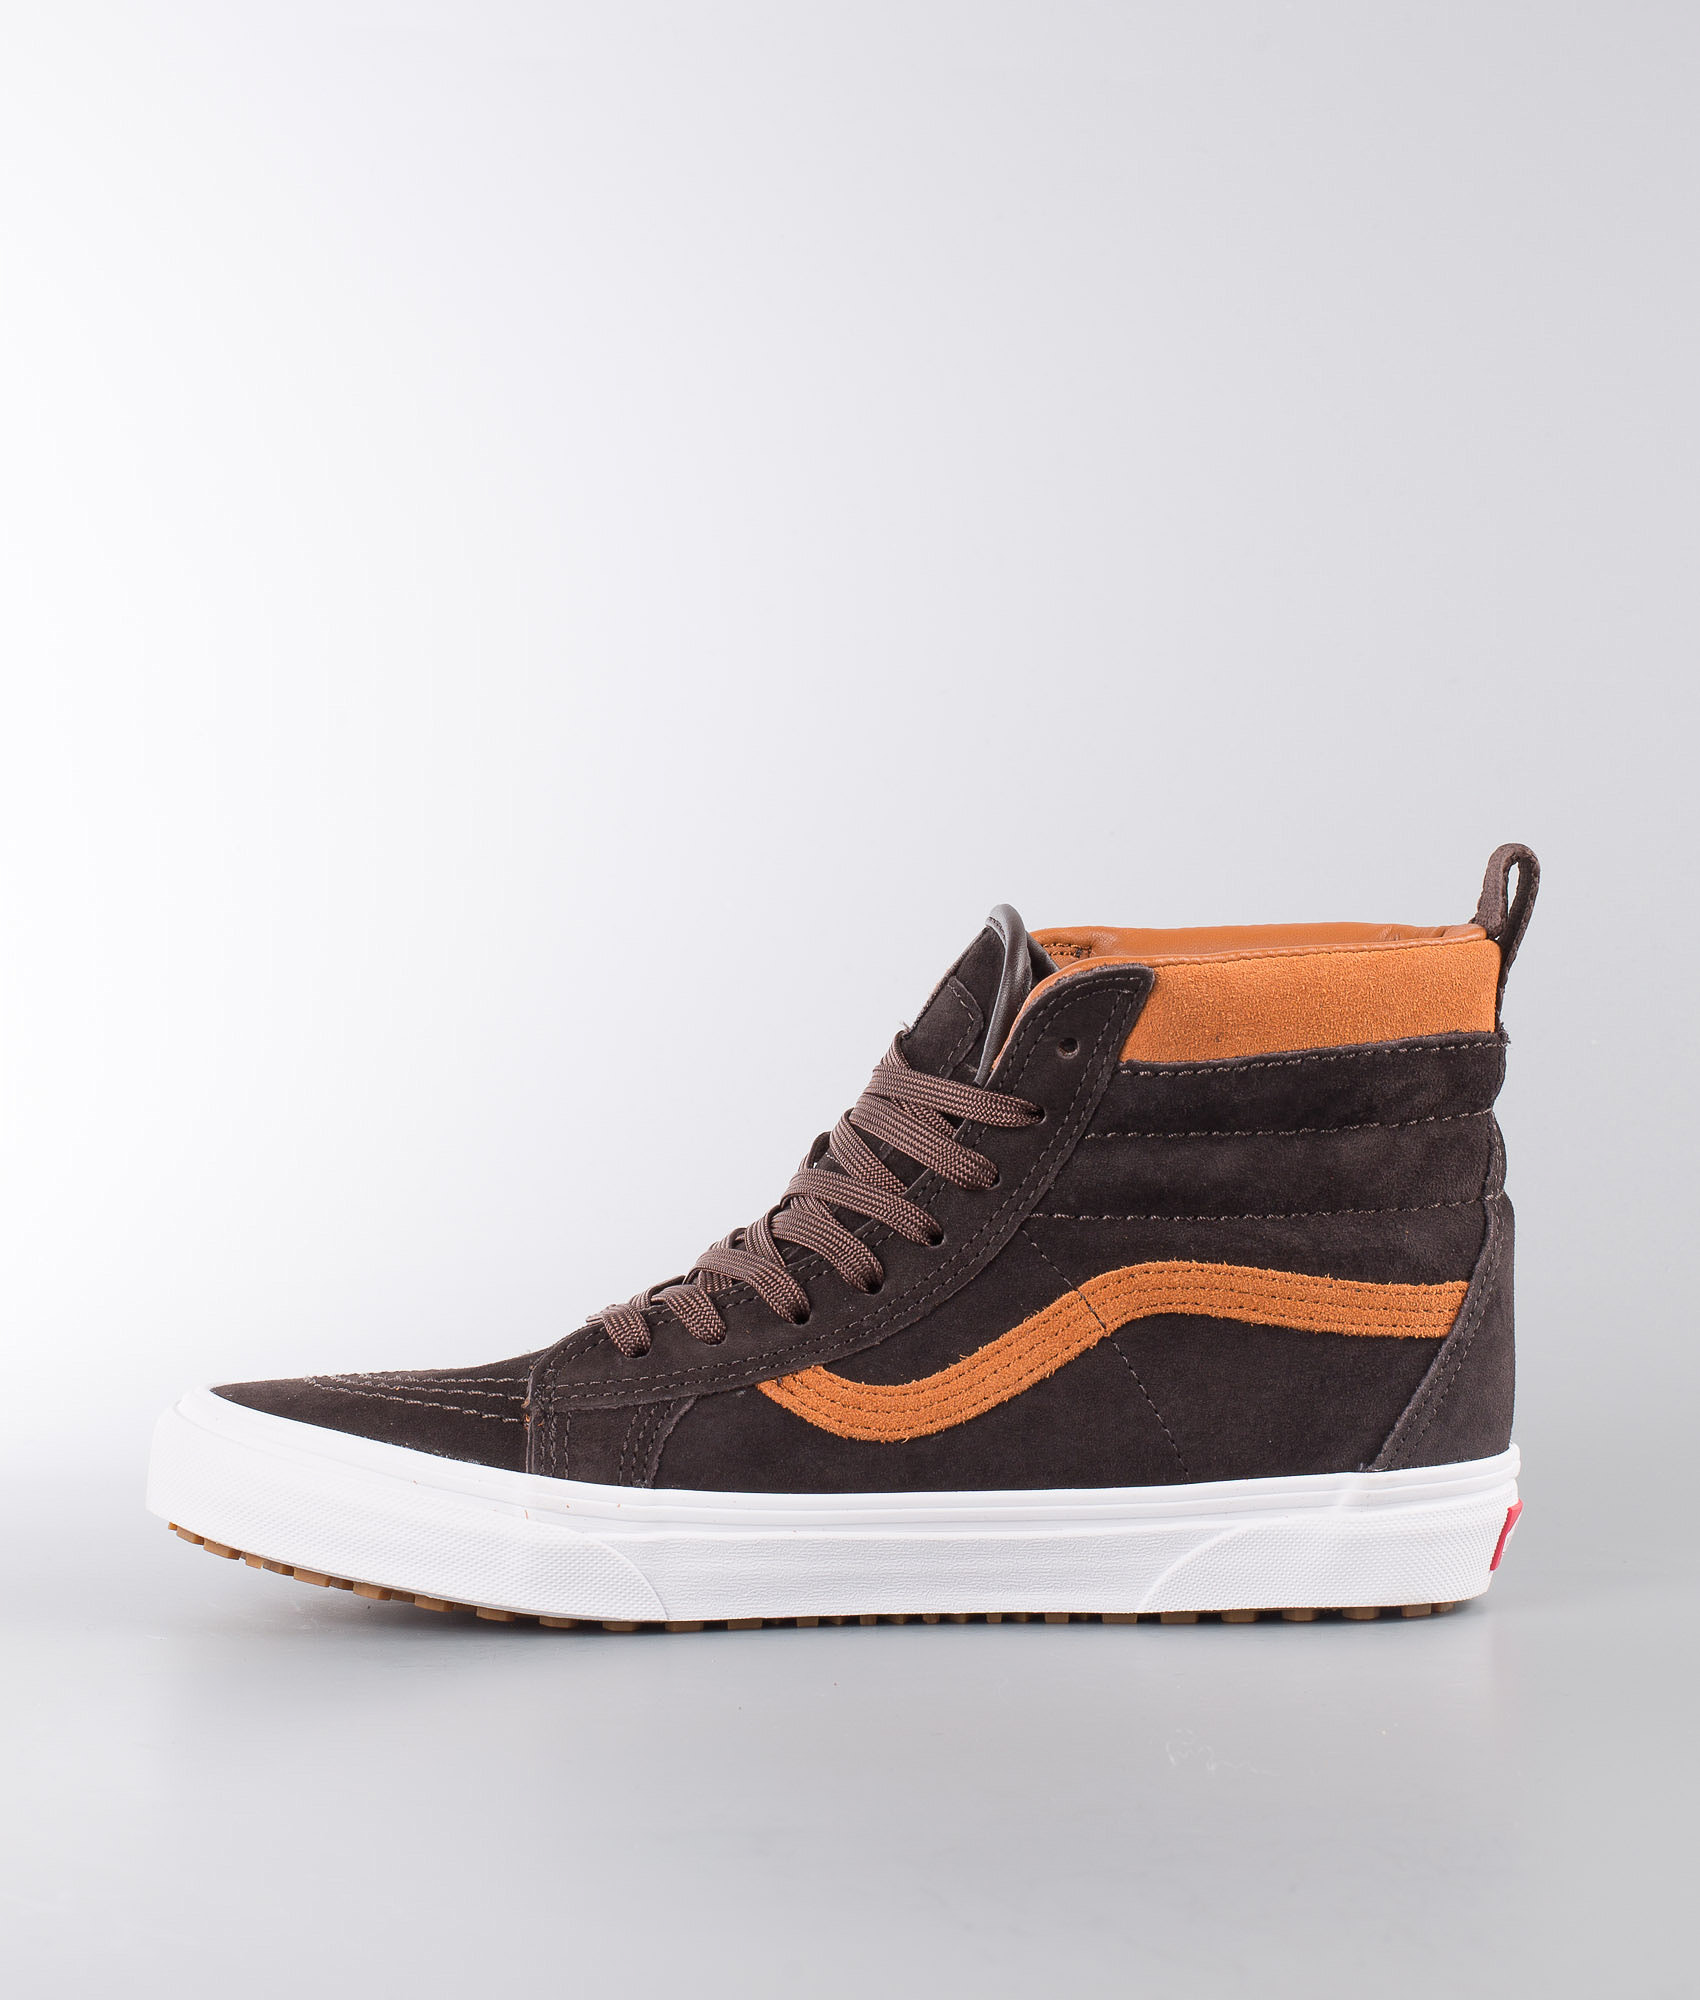 2ccf8cfc9a27 Vans Sk8-Hi Mte Shoes (Mte) Suede Chocolate Torte - Ridestore.com